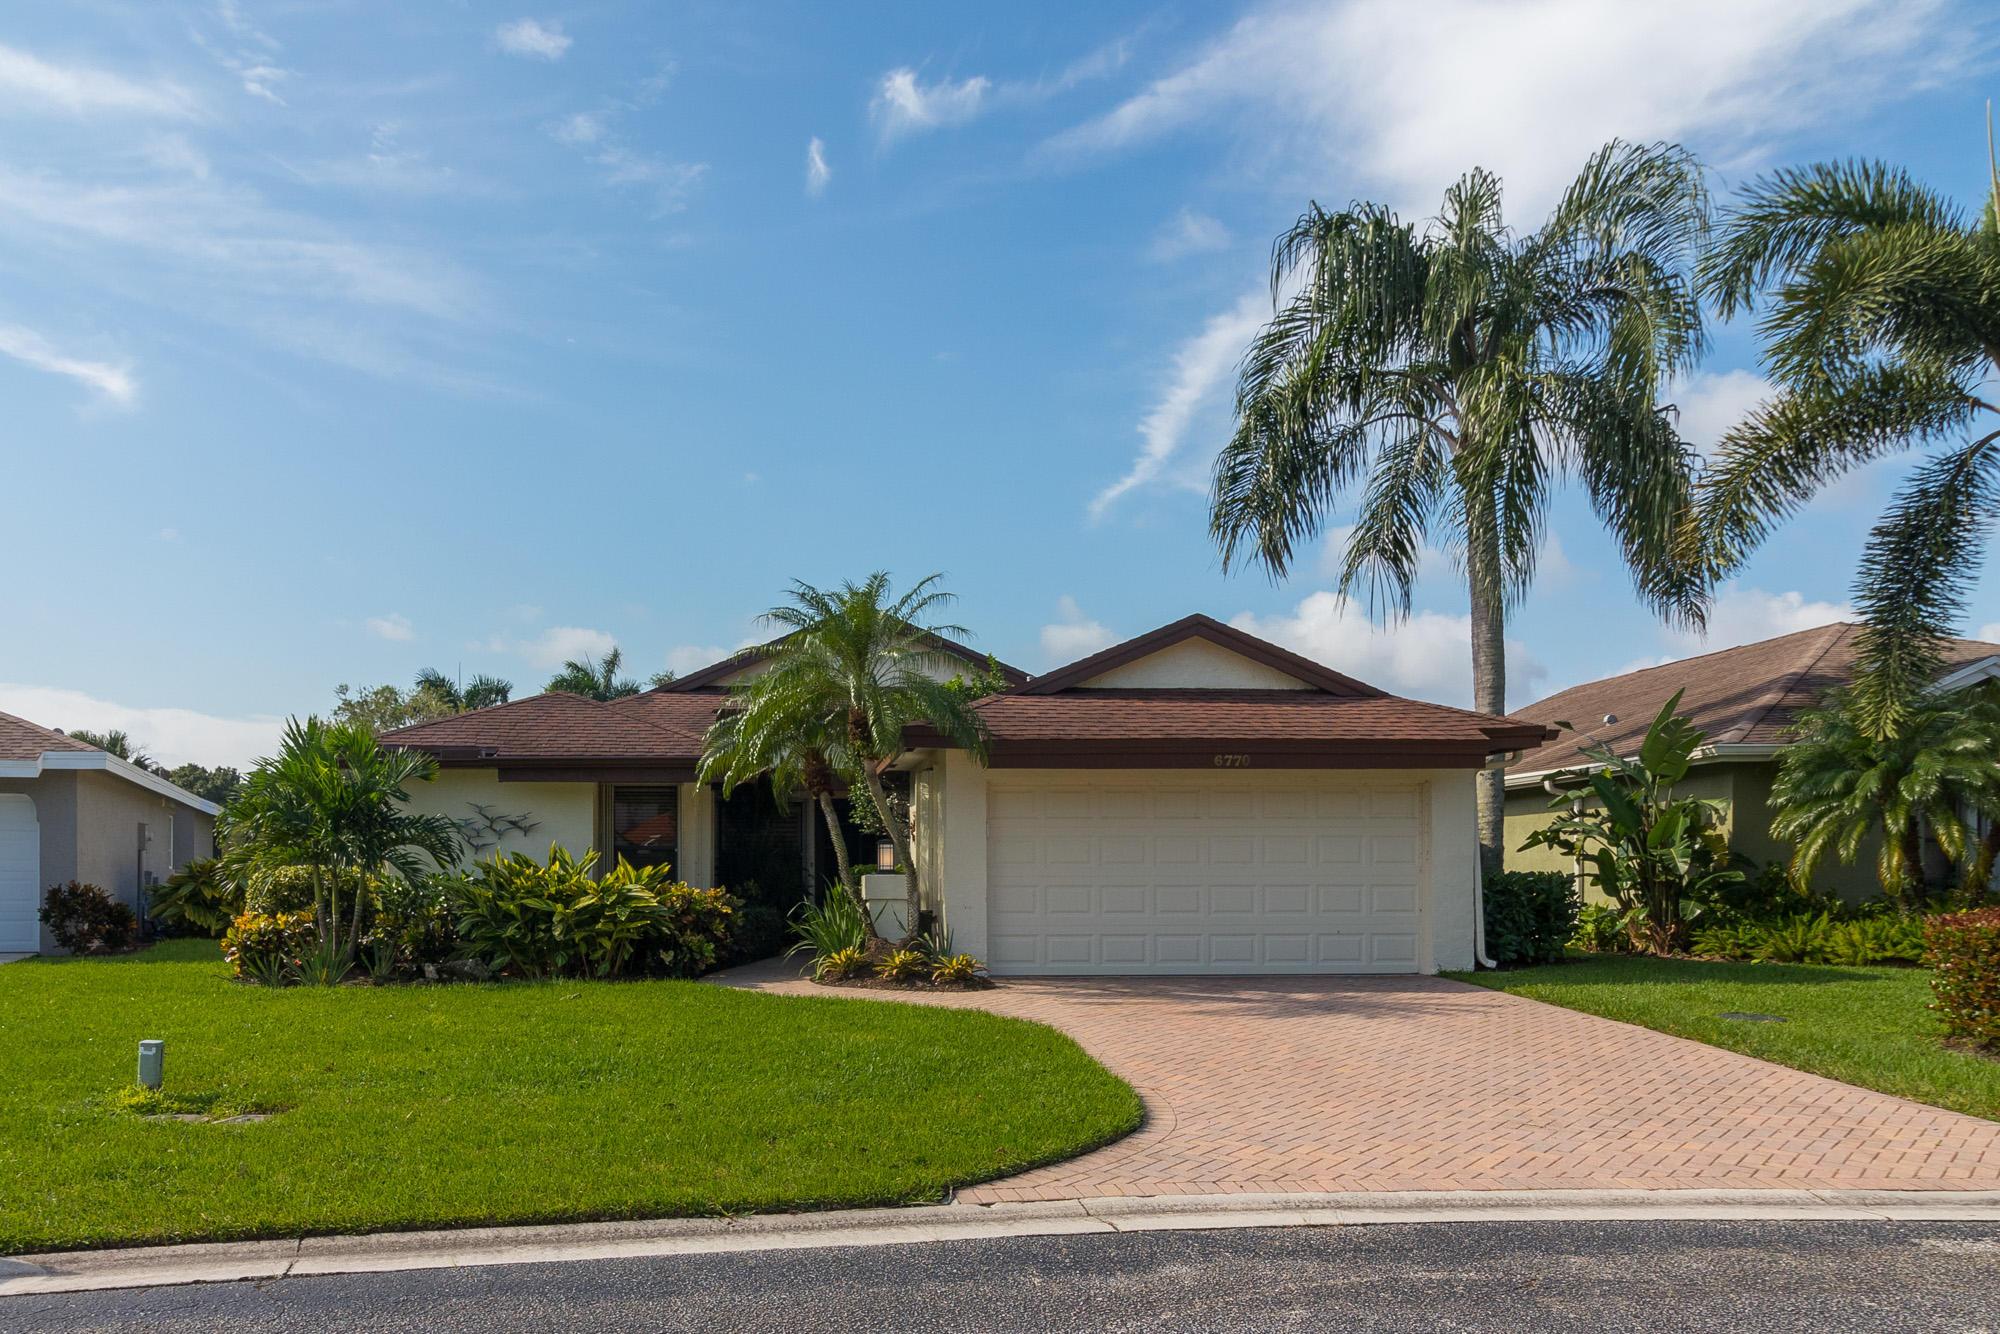 6770 Touchstone Circle, Palm Beach Gardens, Florida 33418, 2 Bedrooms Bedrooms, ,2 BathroomsBathrooms,F,Single family,Touchstone,RX-10558192